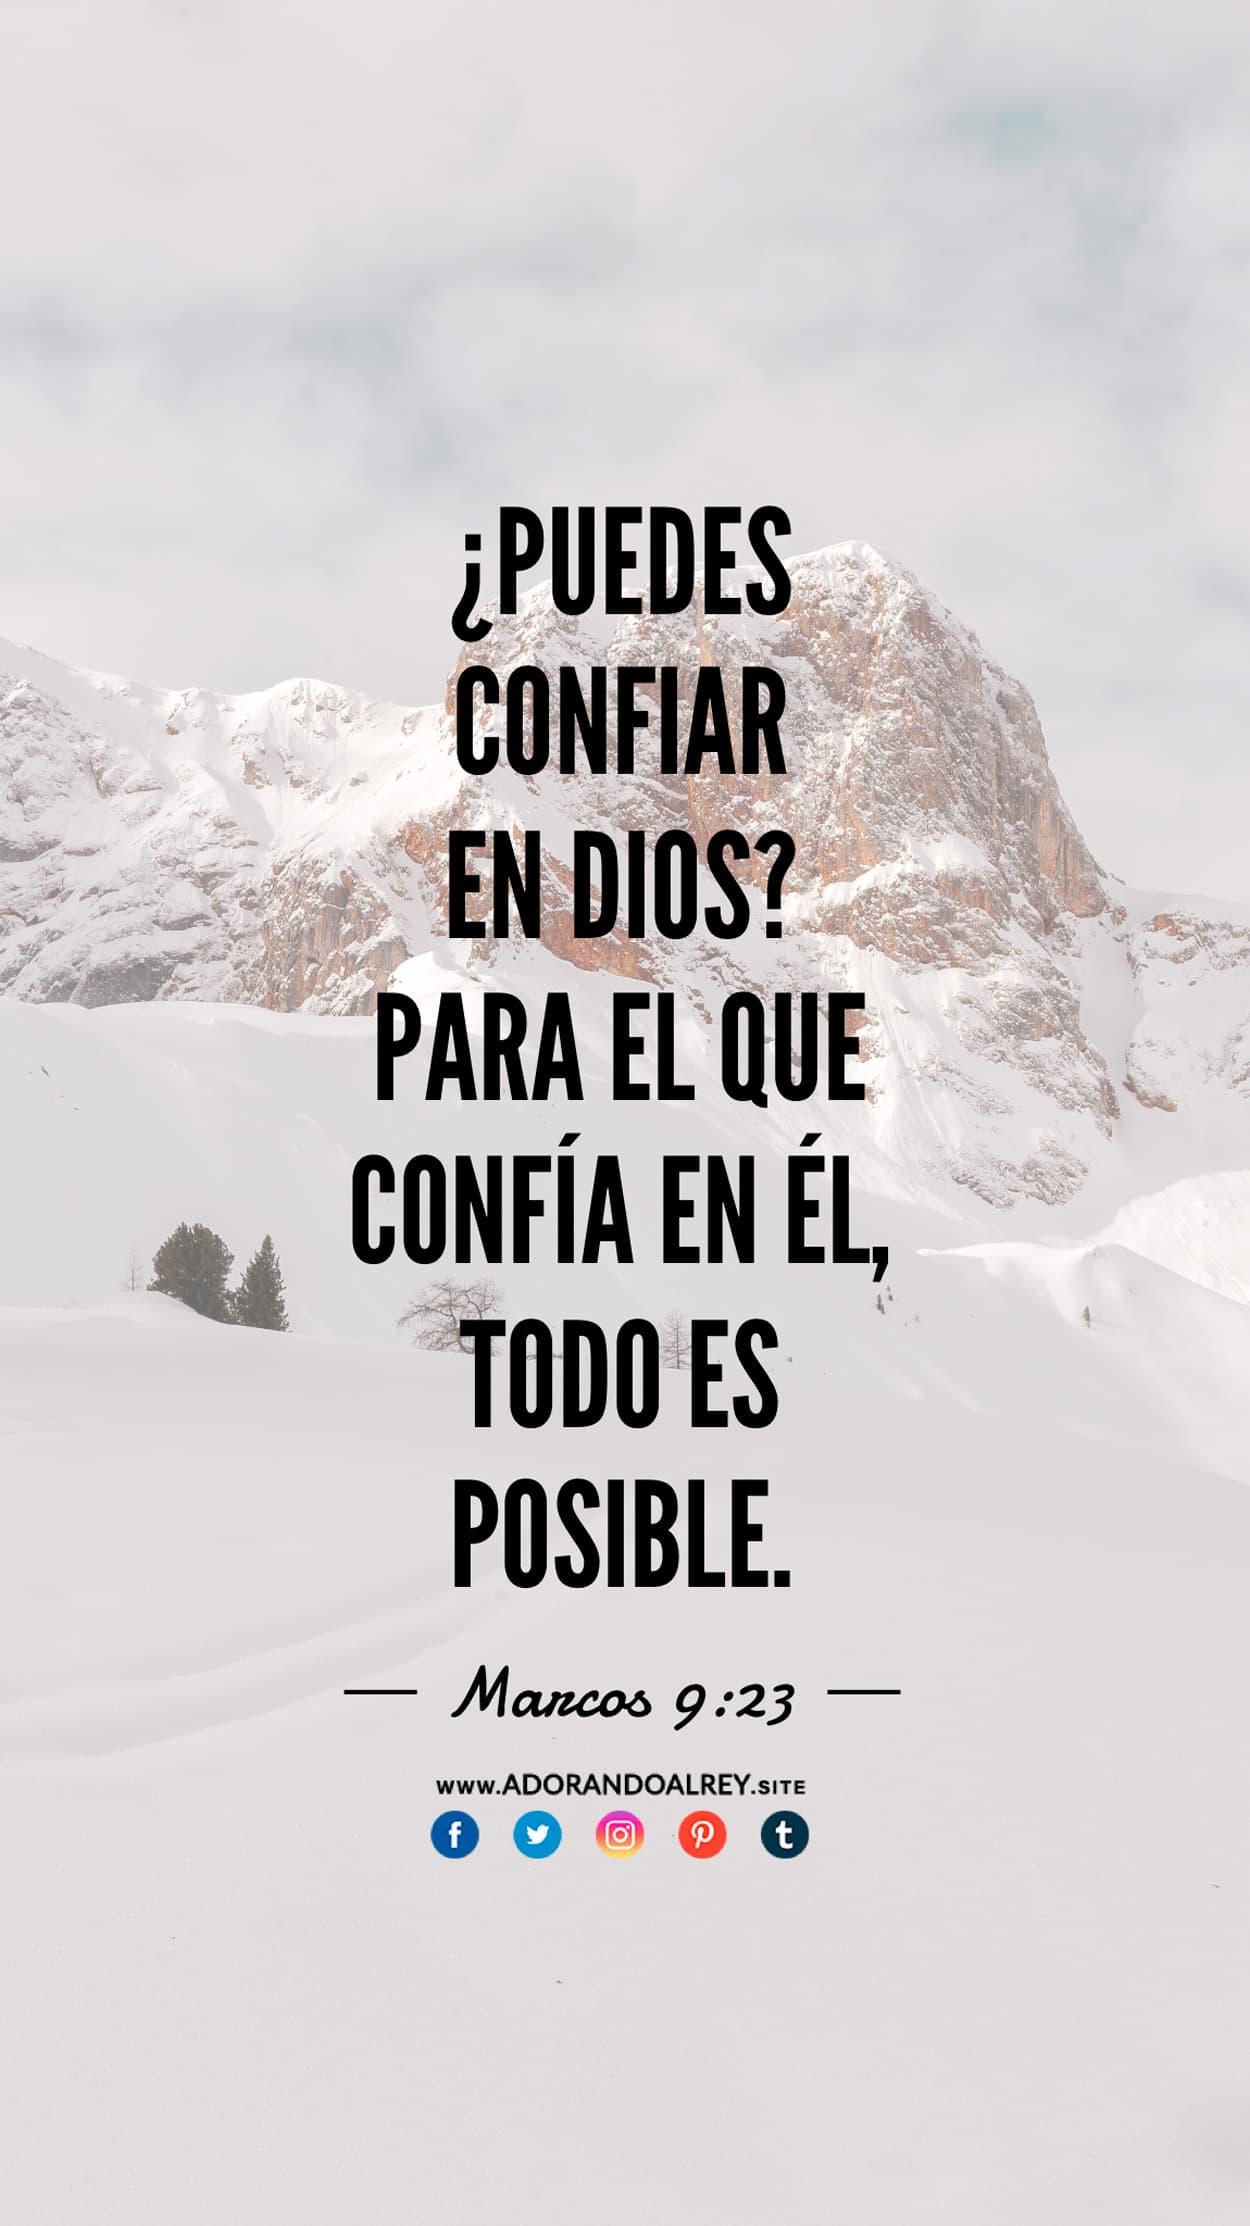 Marcos 9:23